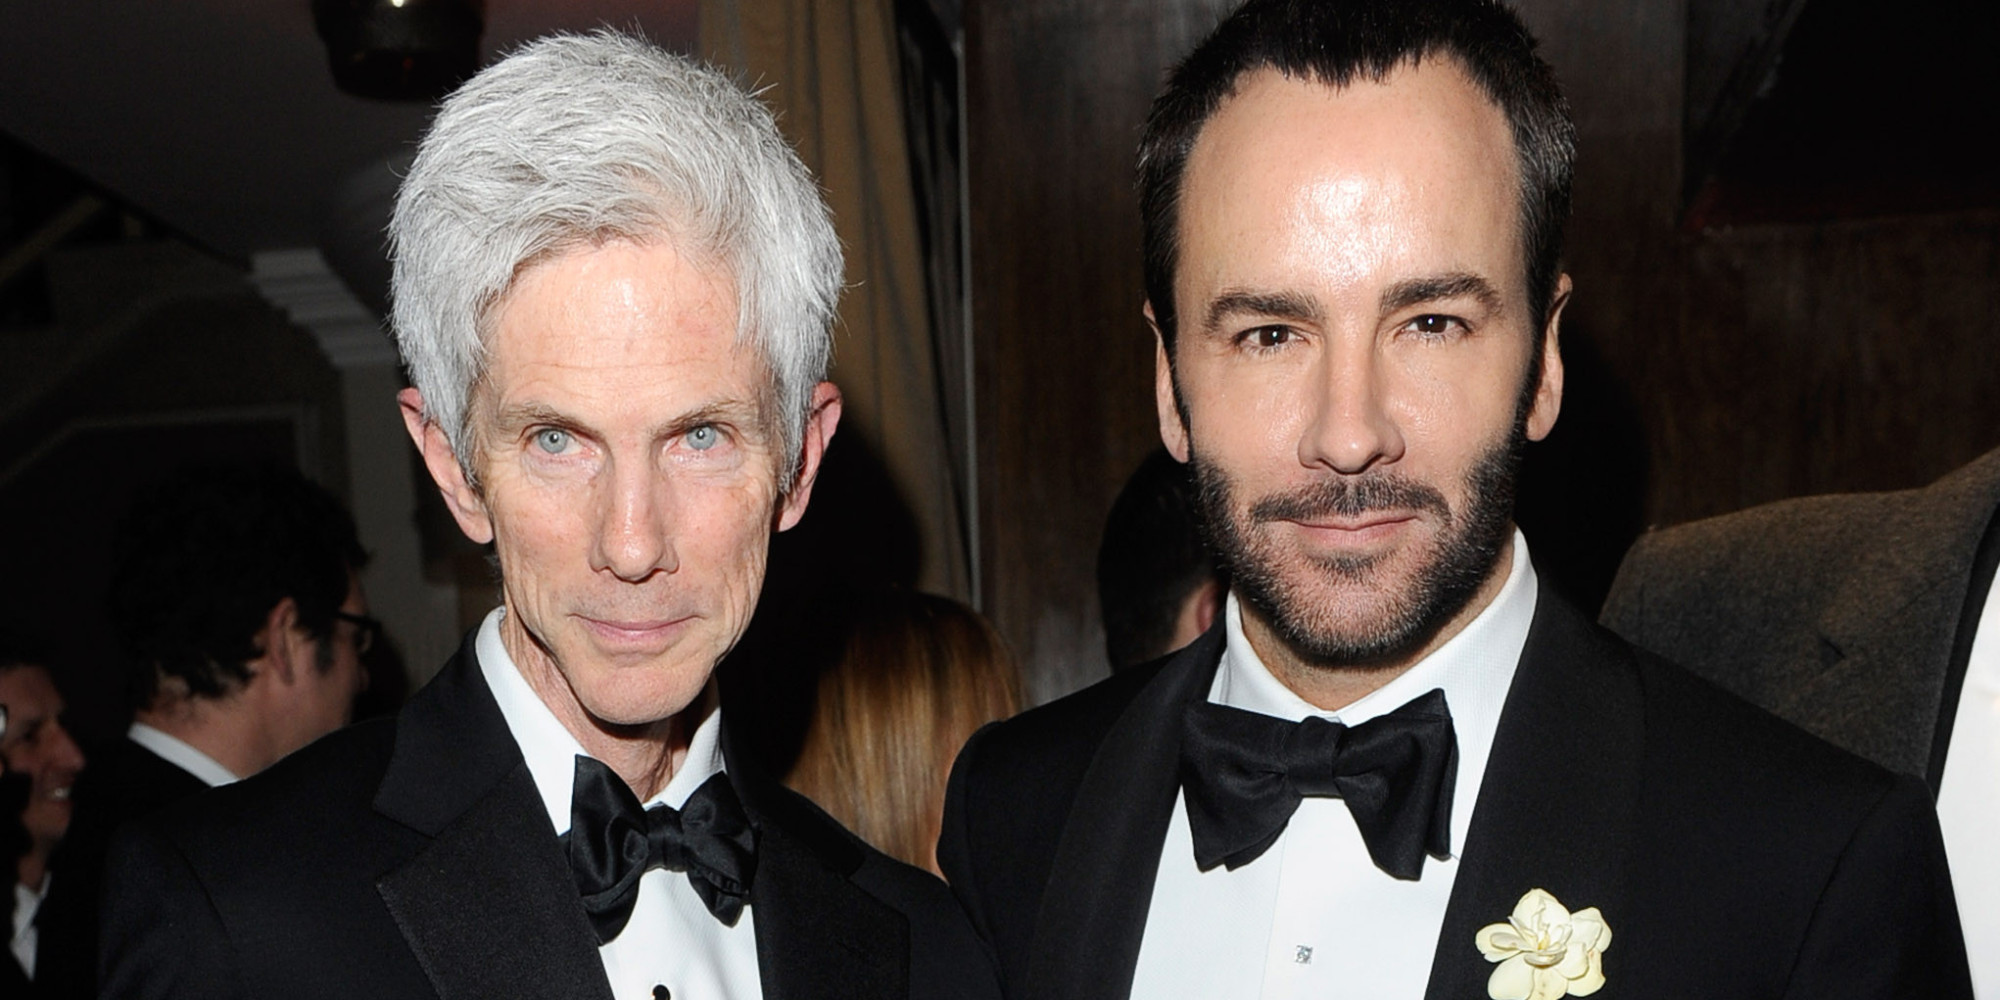 Tom Ford Marries Longtime Partner Richard Buckley